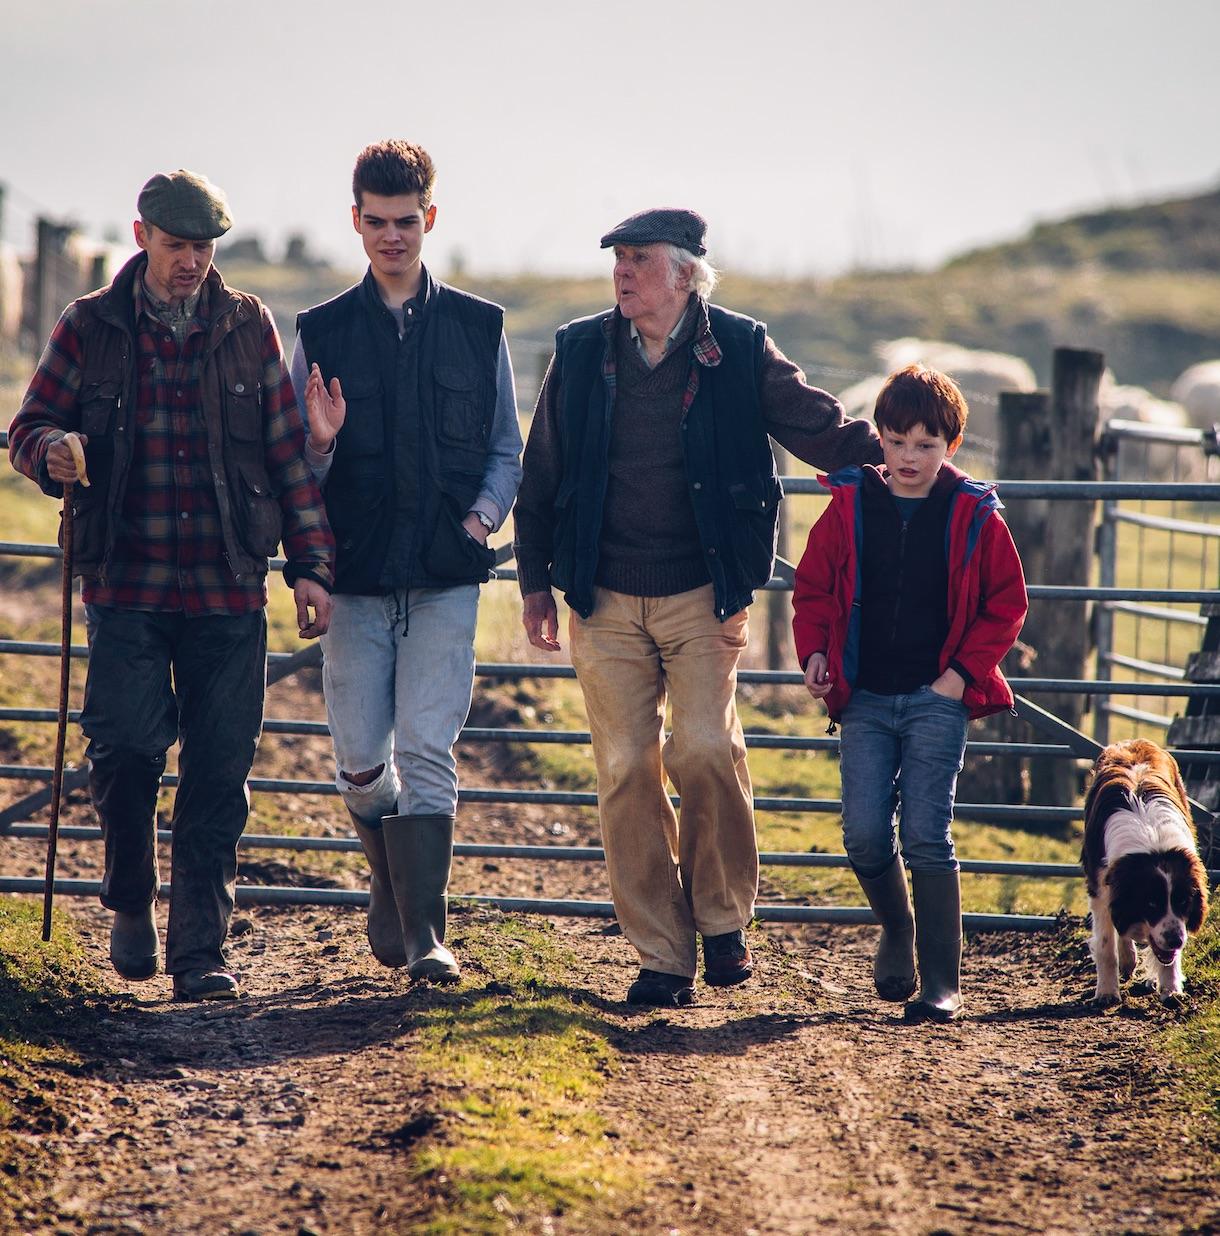 Farming-runs-in-the-Family-594955222_5184x3456_jpeg.jpg